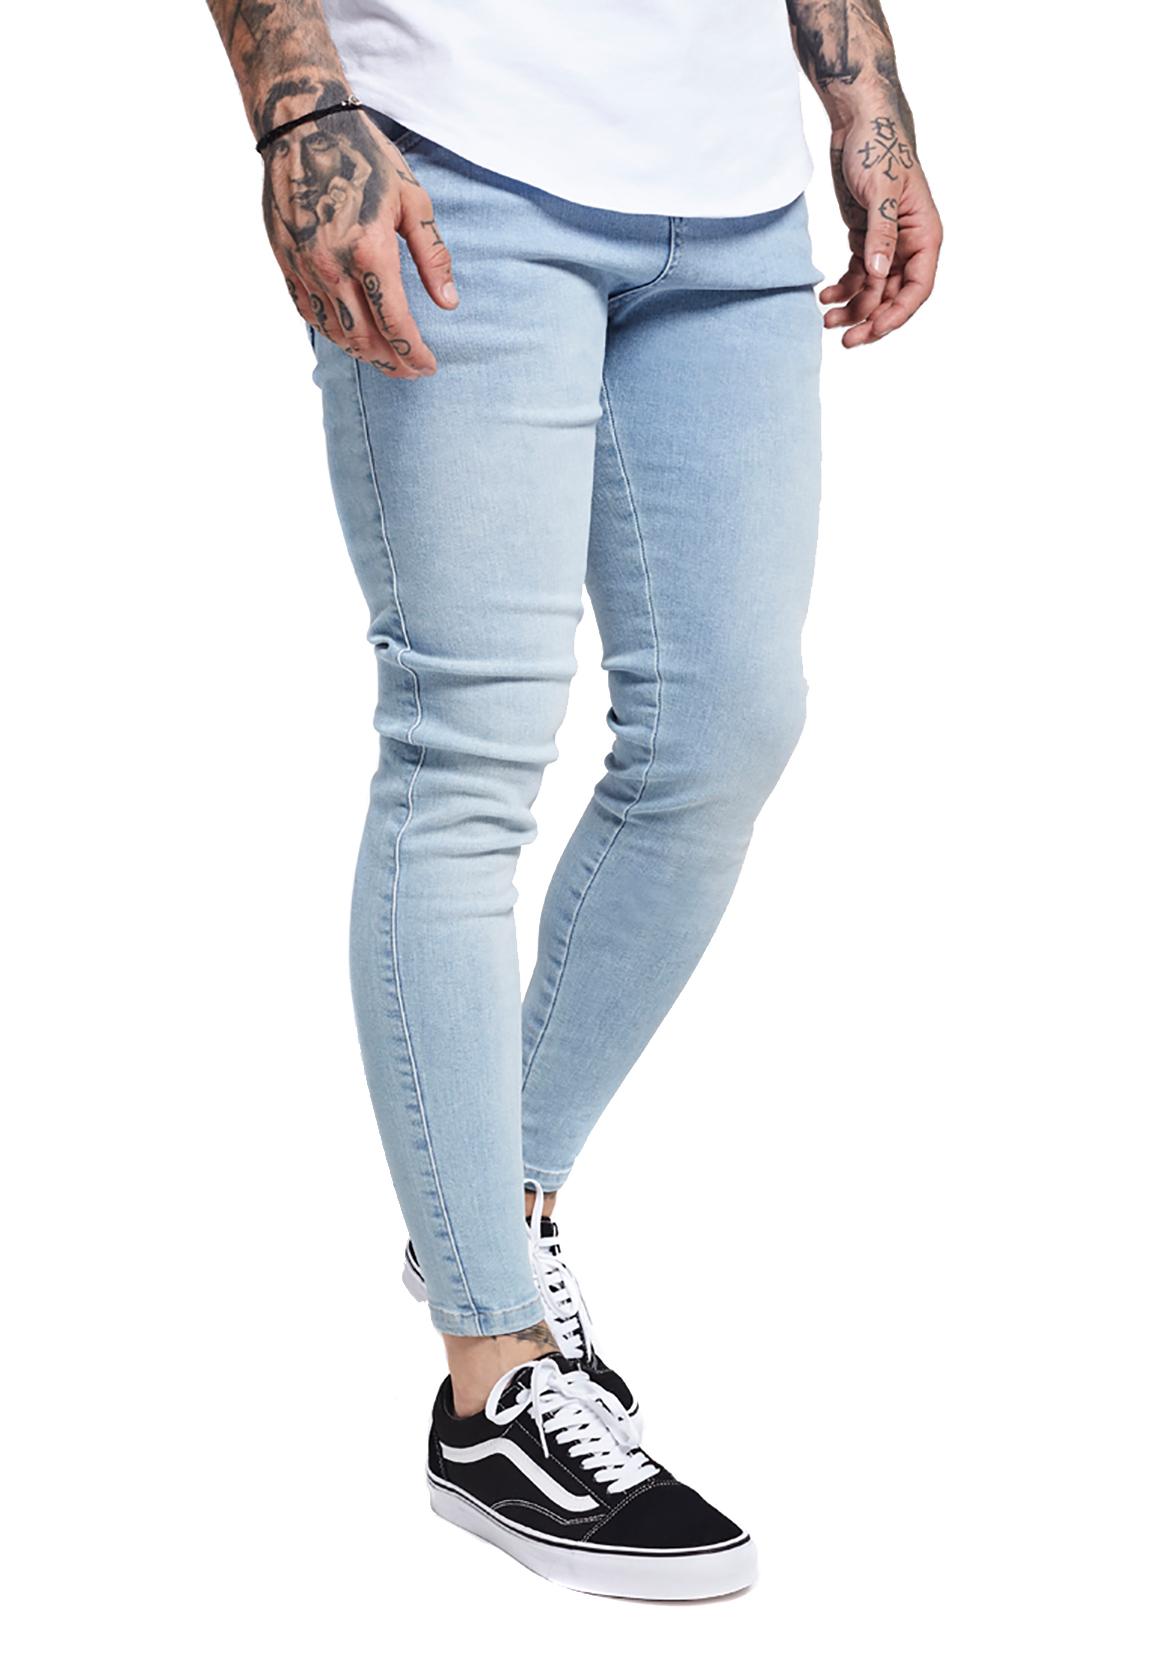 siksilk herren jeans skinny denim ss 13003 hellblau light. Black Bedroom Furniture Sets. Home Design Ideas